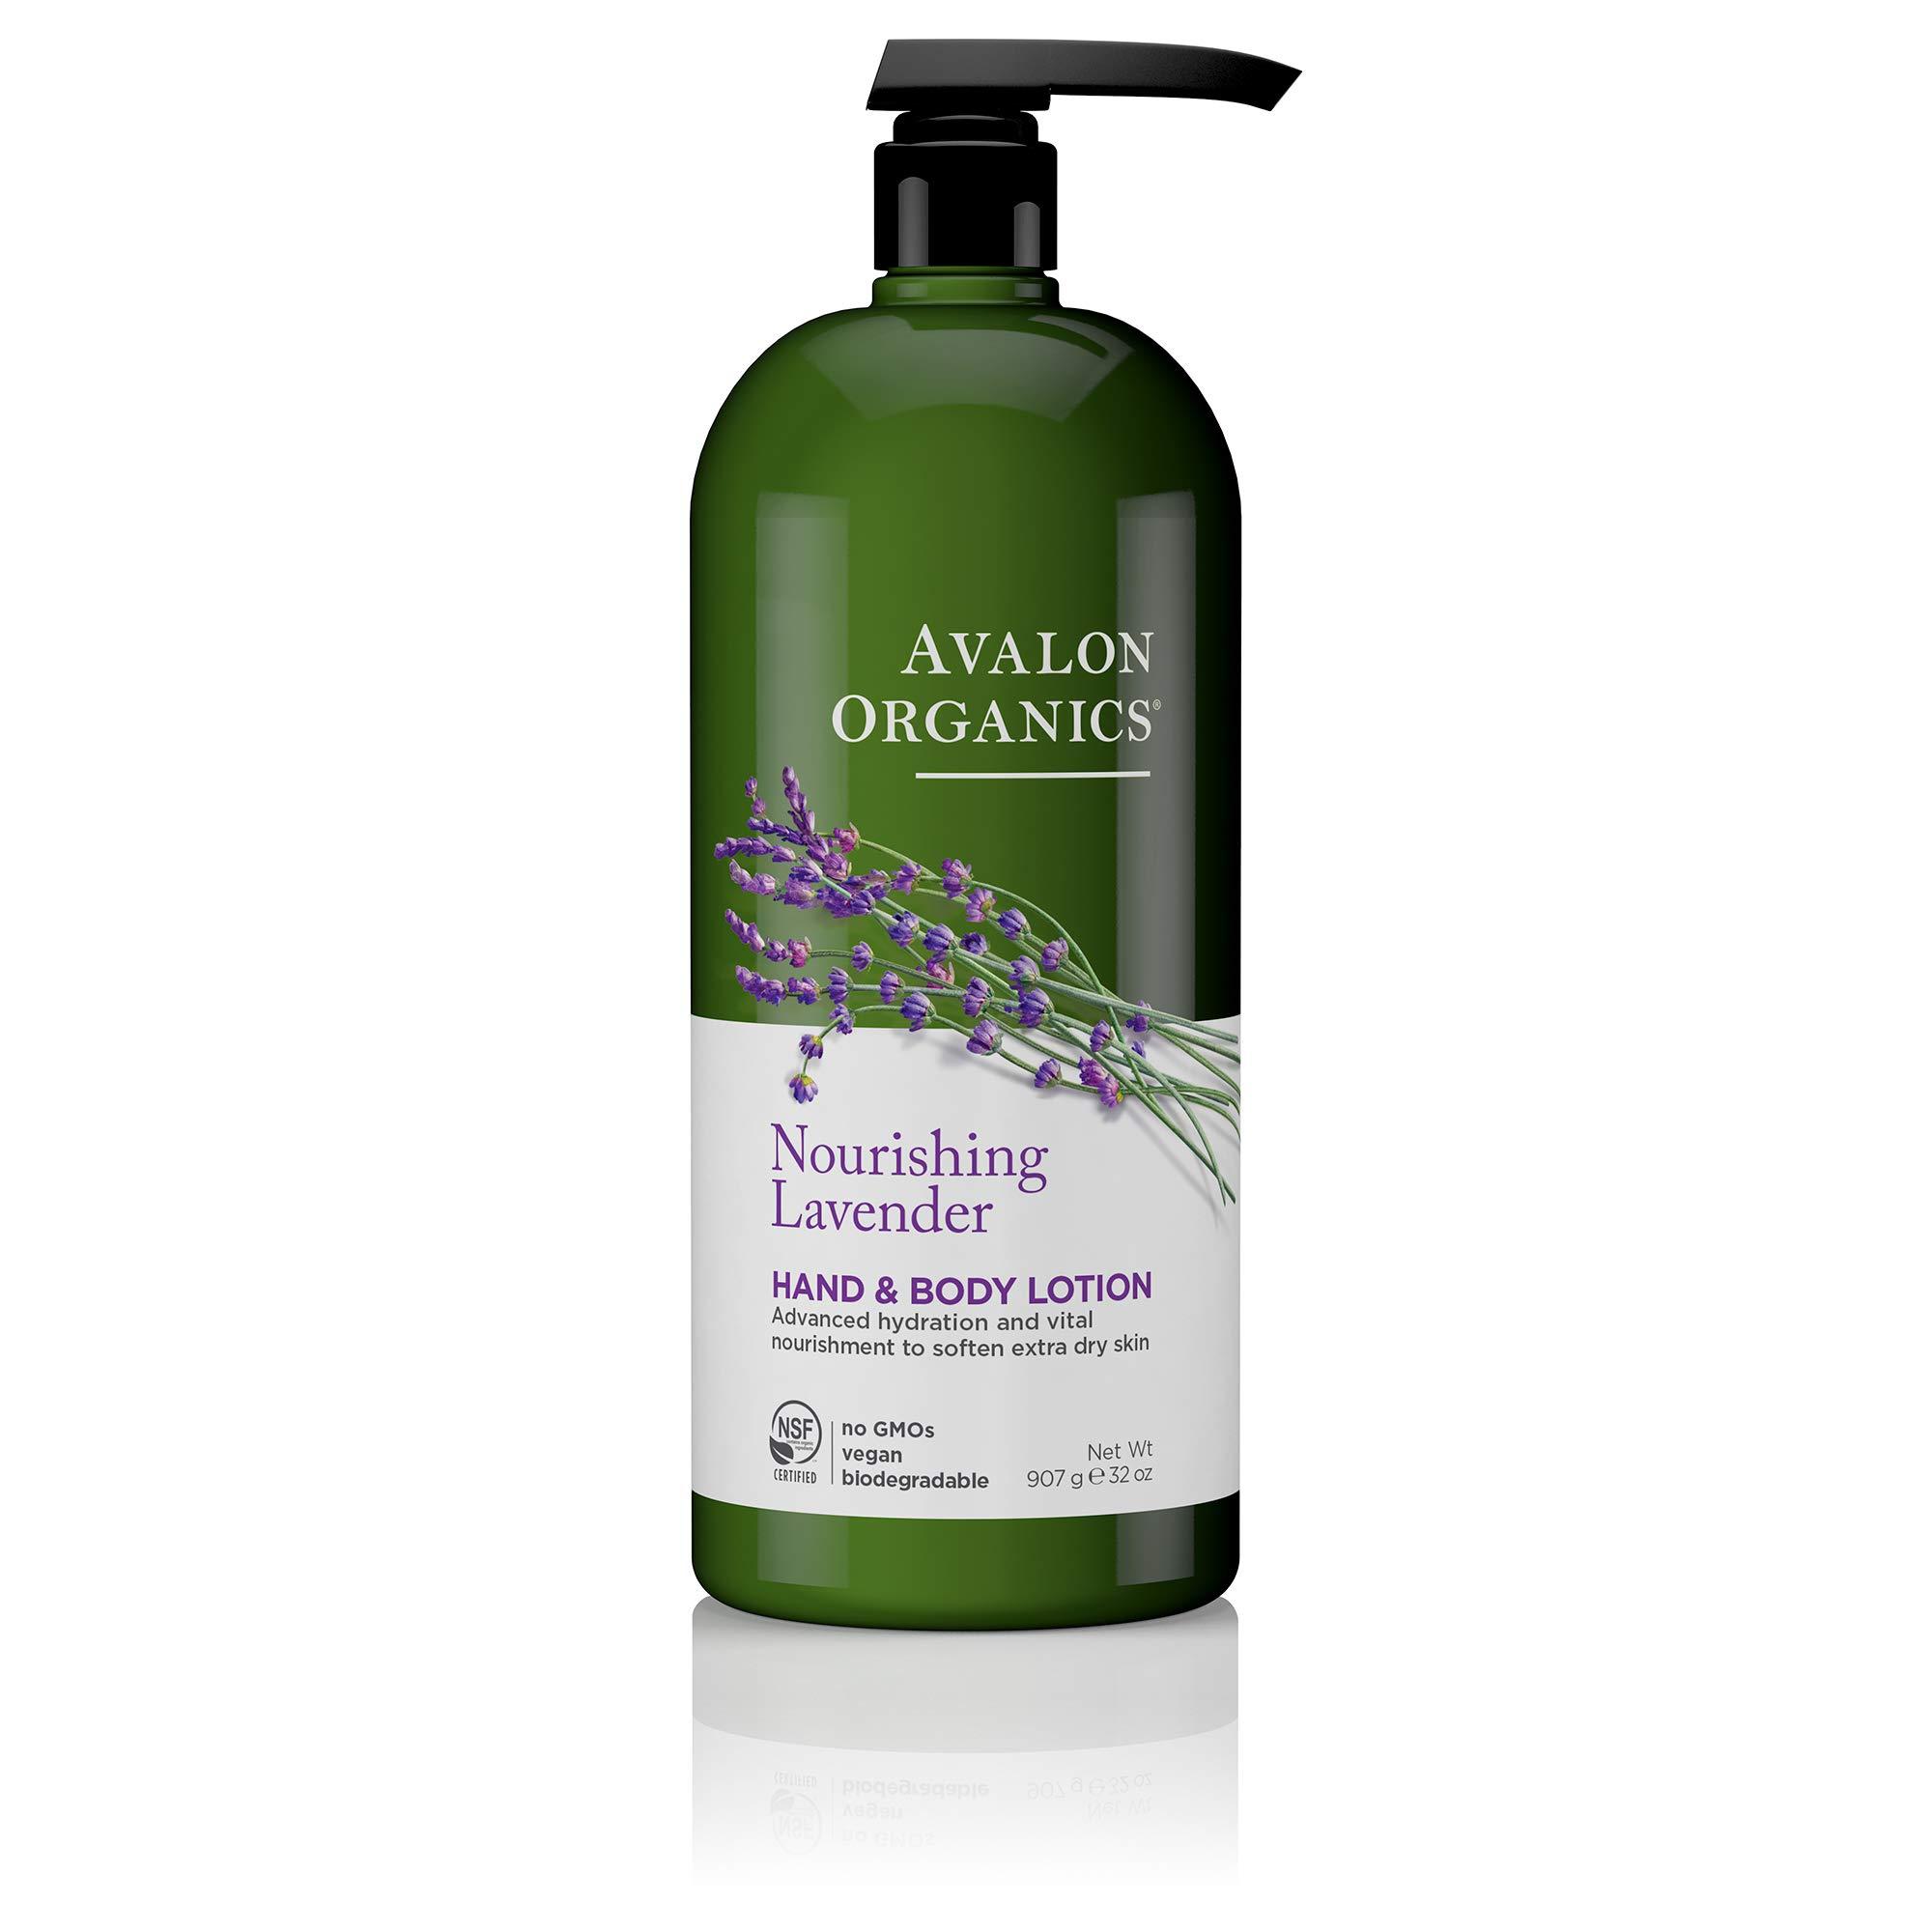 Avalon Organics Nourishing Lavender Hand & Body Lotion, 32 oz. by Avalon Organics